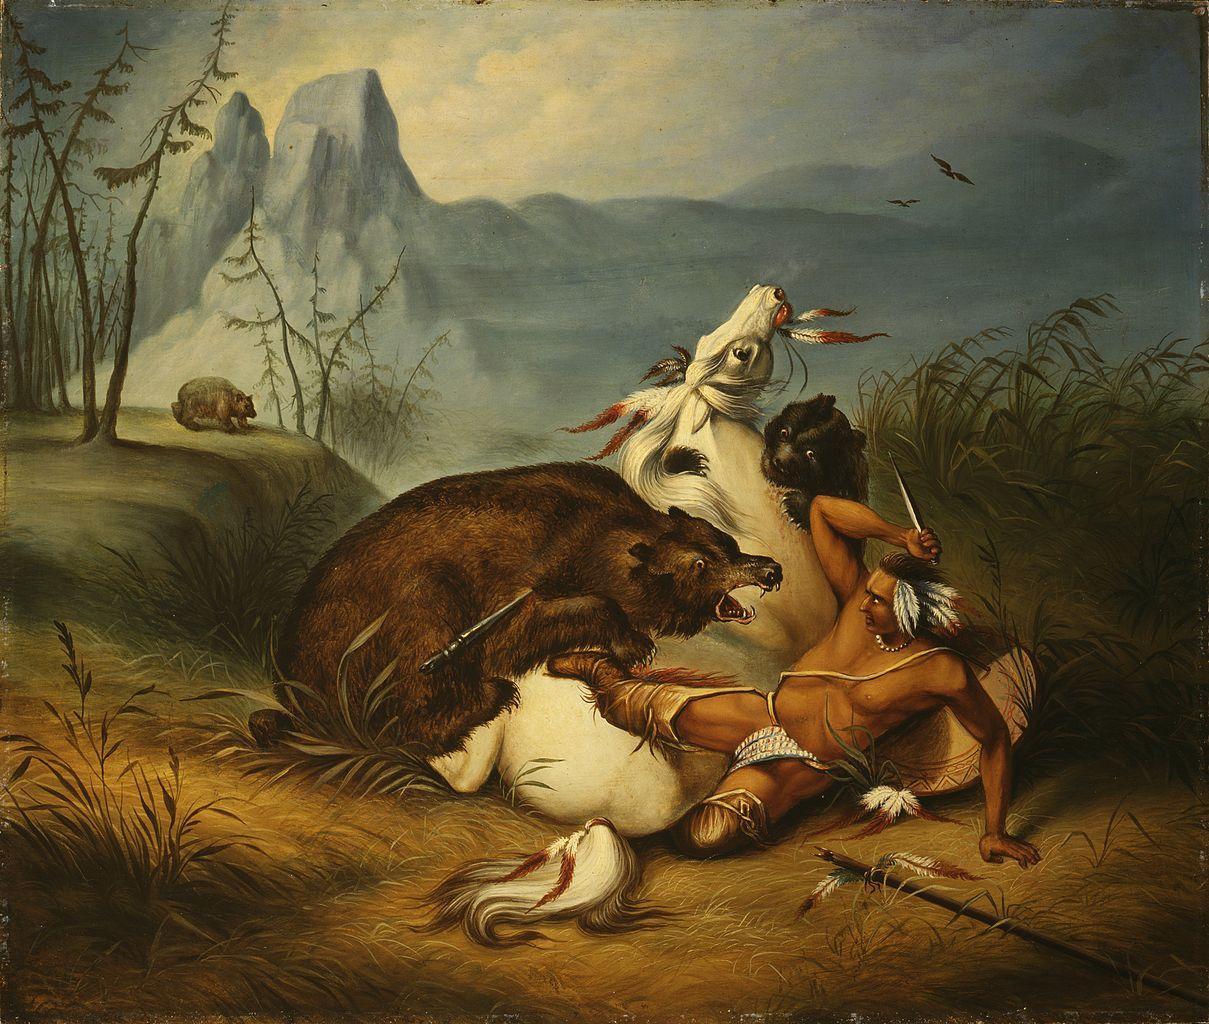 Dela nepoznatih slikara 1209px-Indian_Bear_Fight,_anonymous_painter_%28mid-19th_century%29